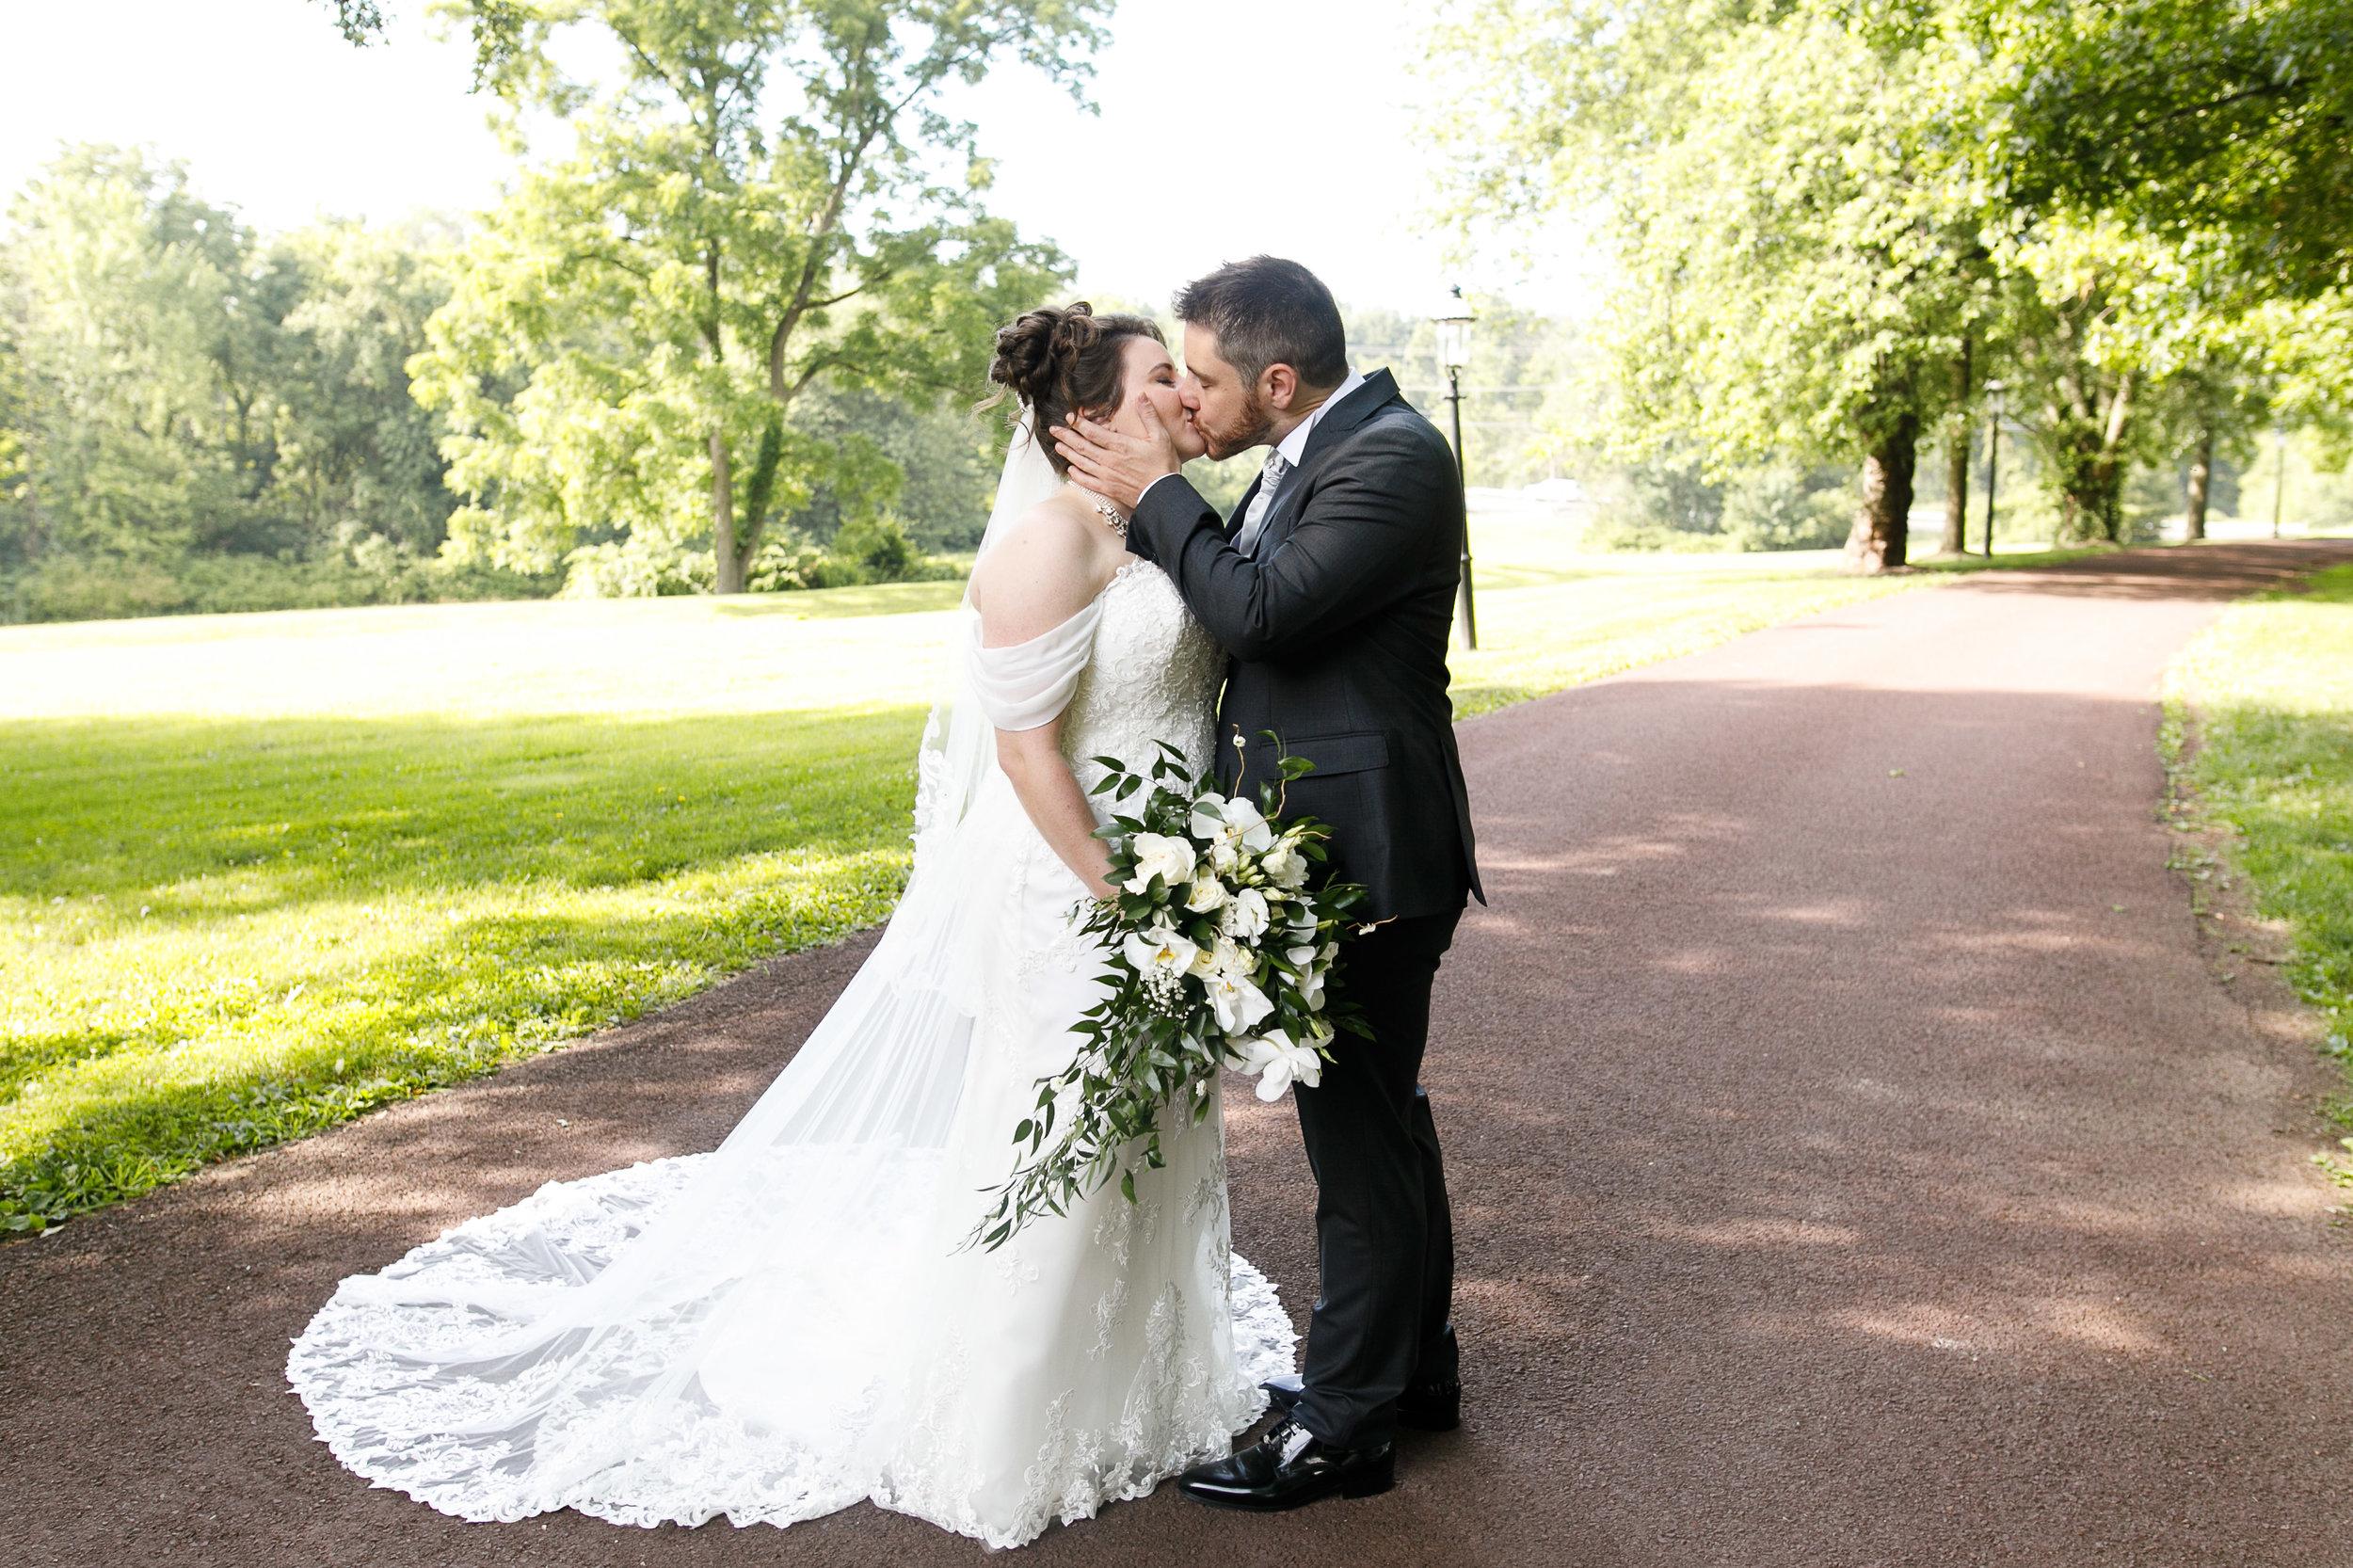 Wedding at Joseph Ambler In Bucks County PA8.jpg